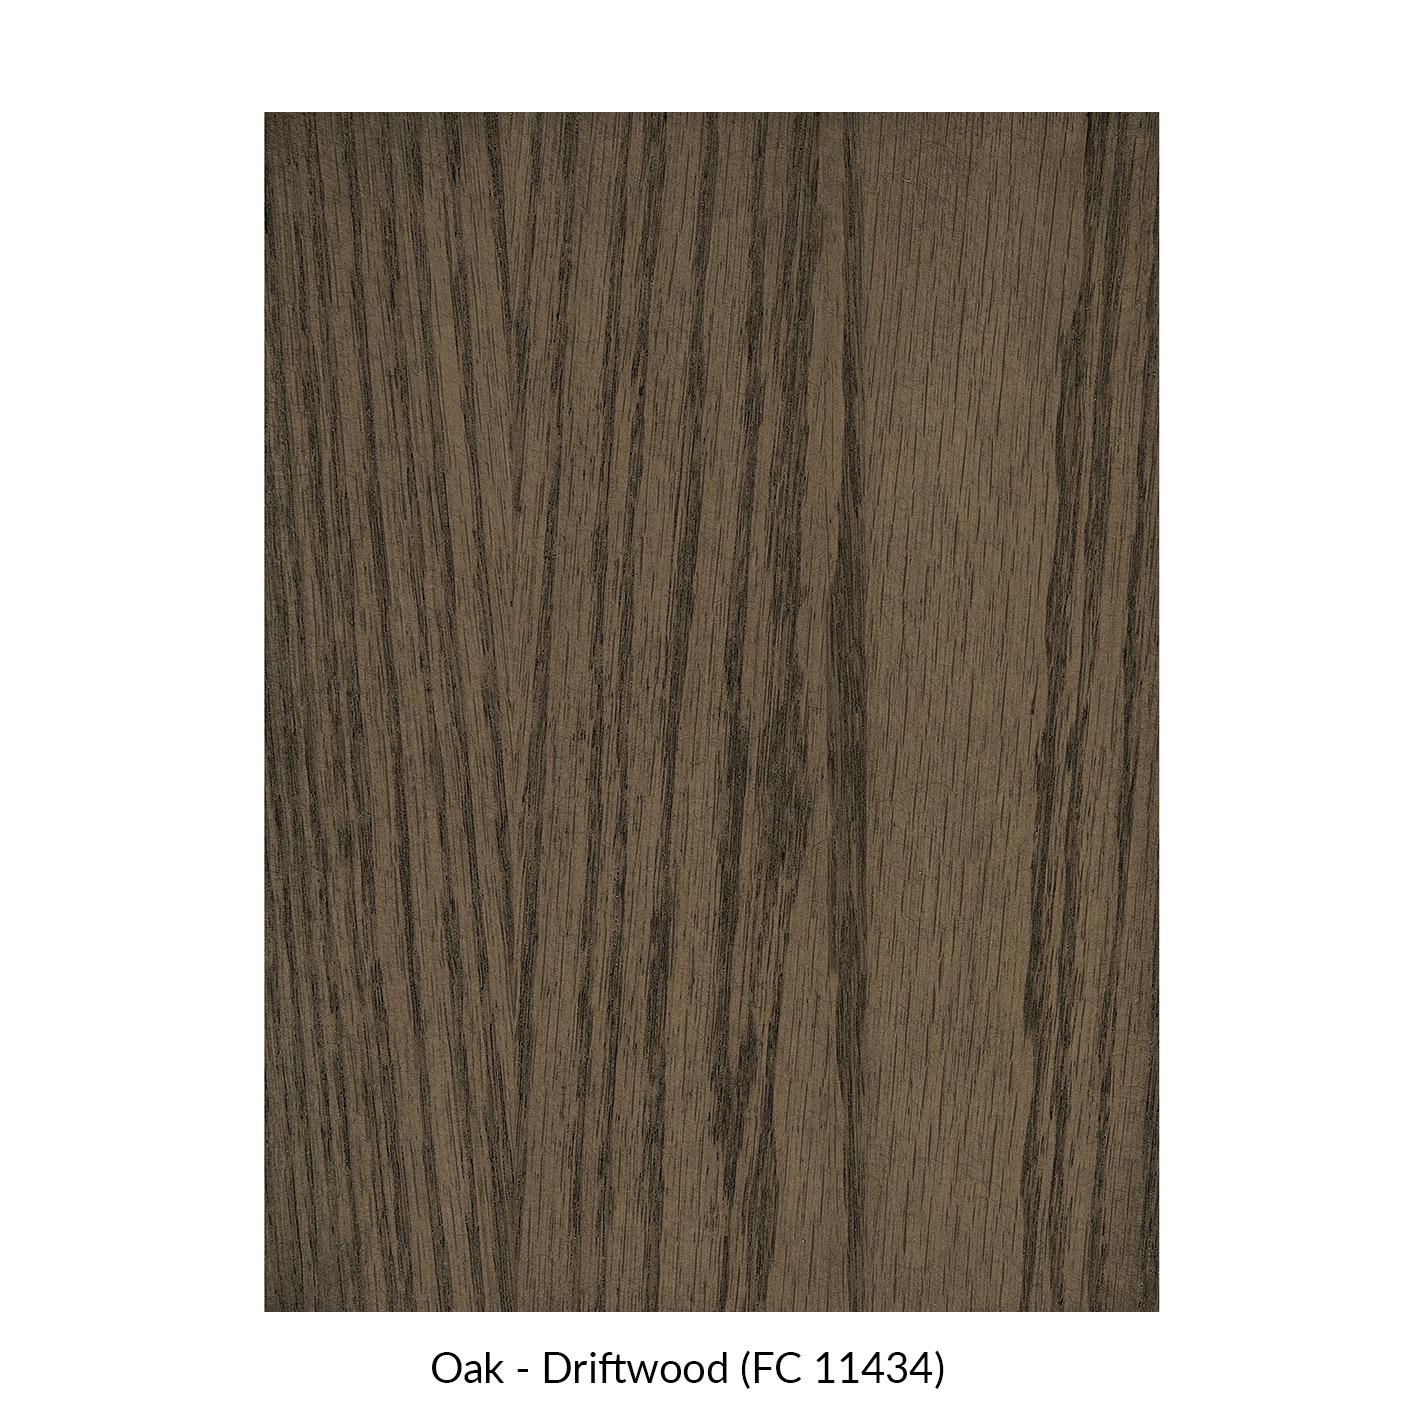 spectrum-oak-driftwood-fc-11434.jpg